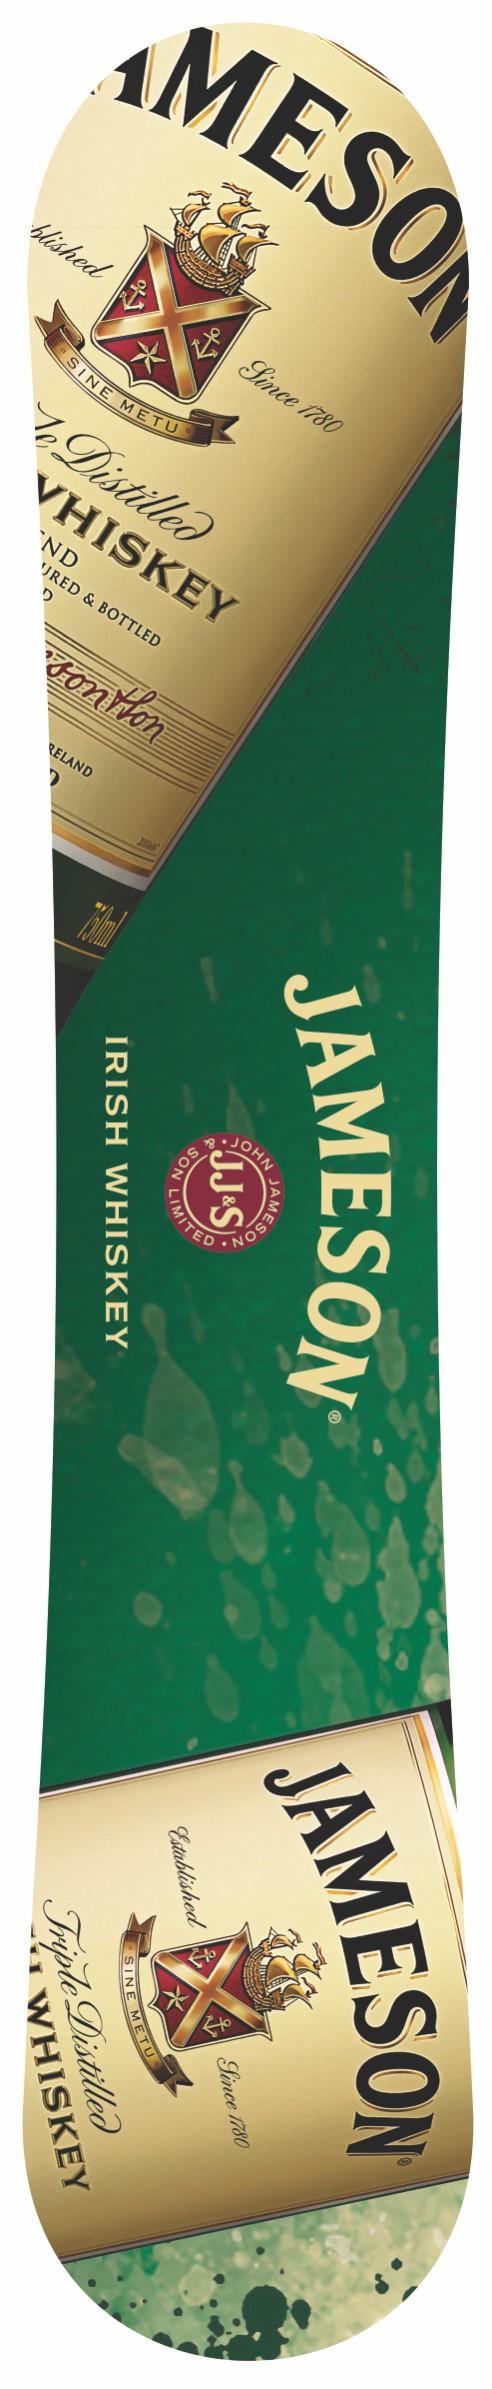 Jameson Snowboard - Bottles.jpg